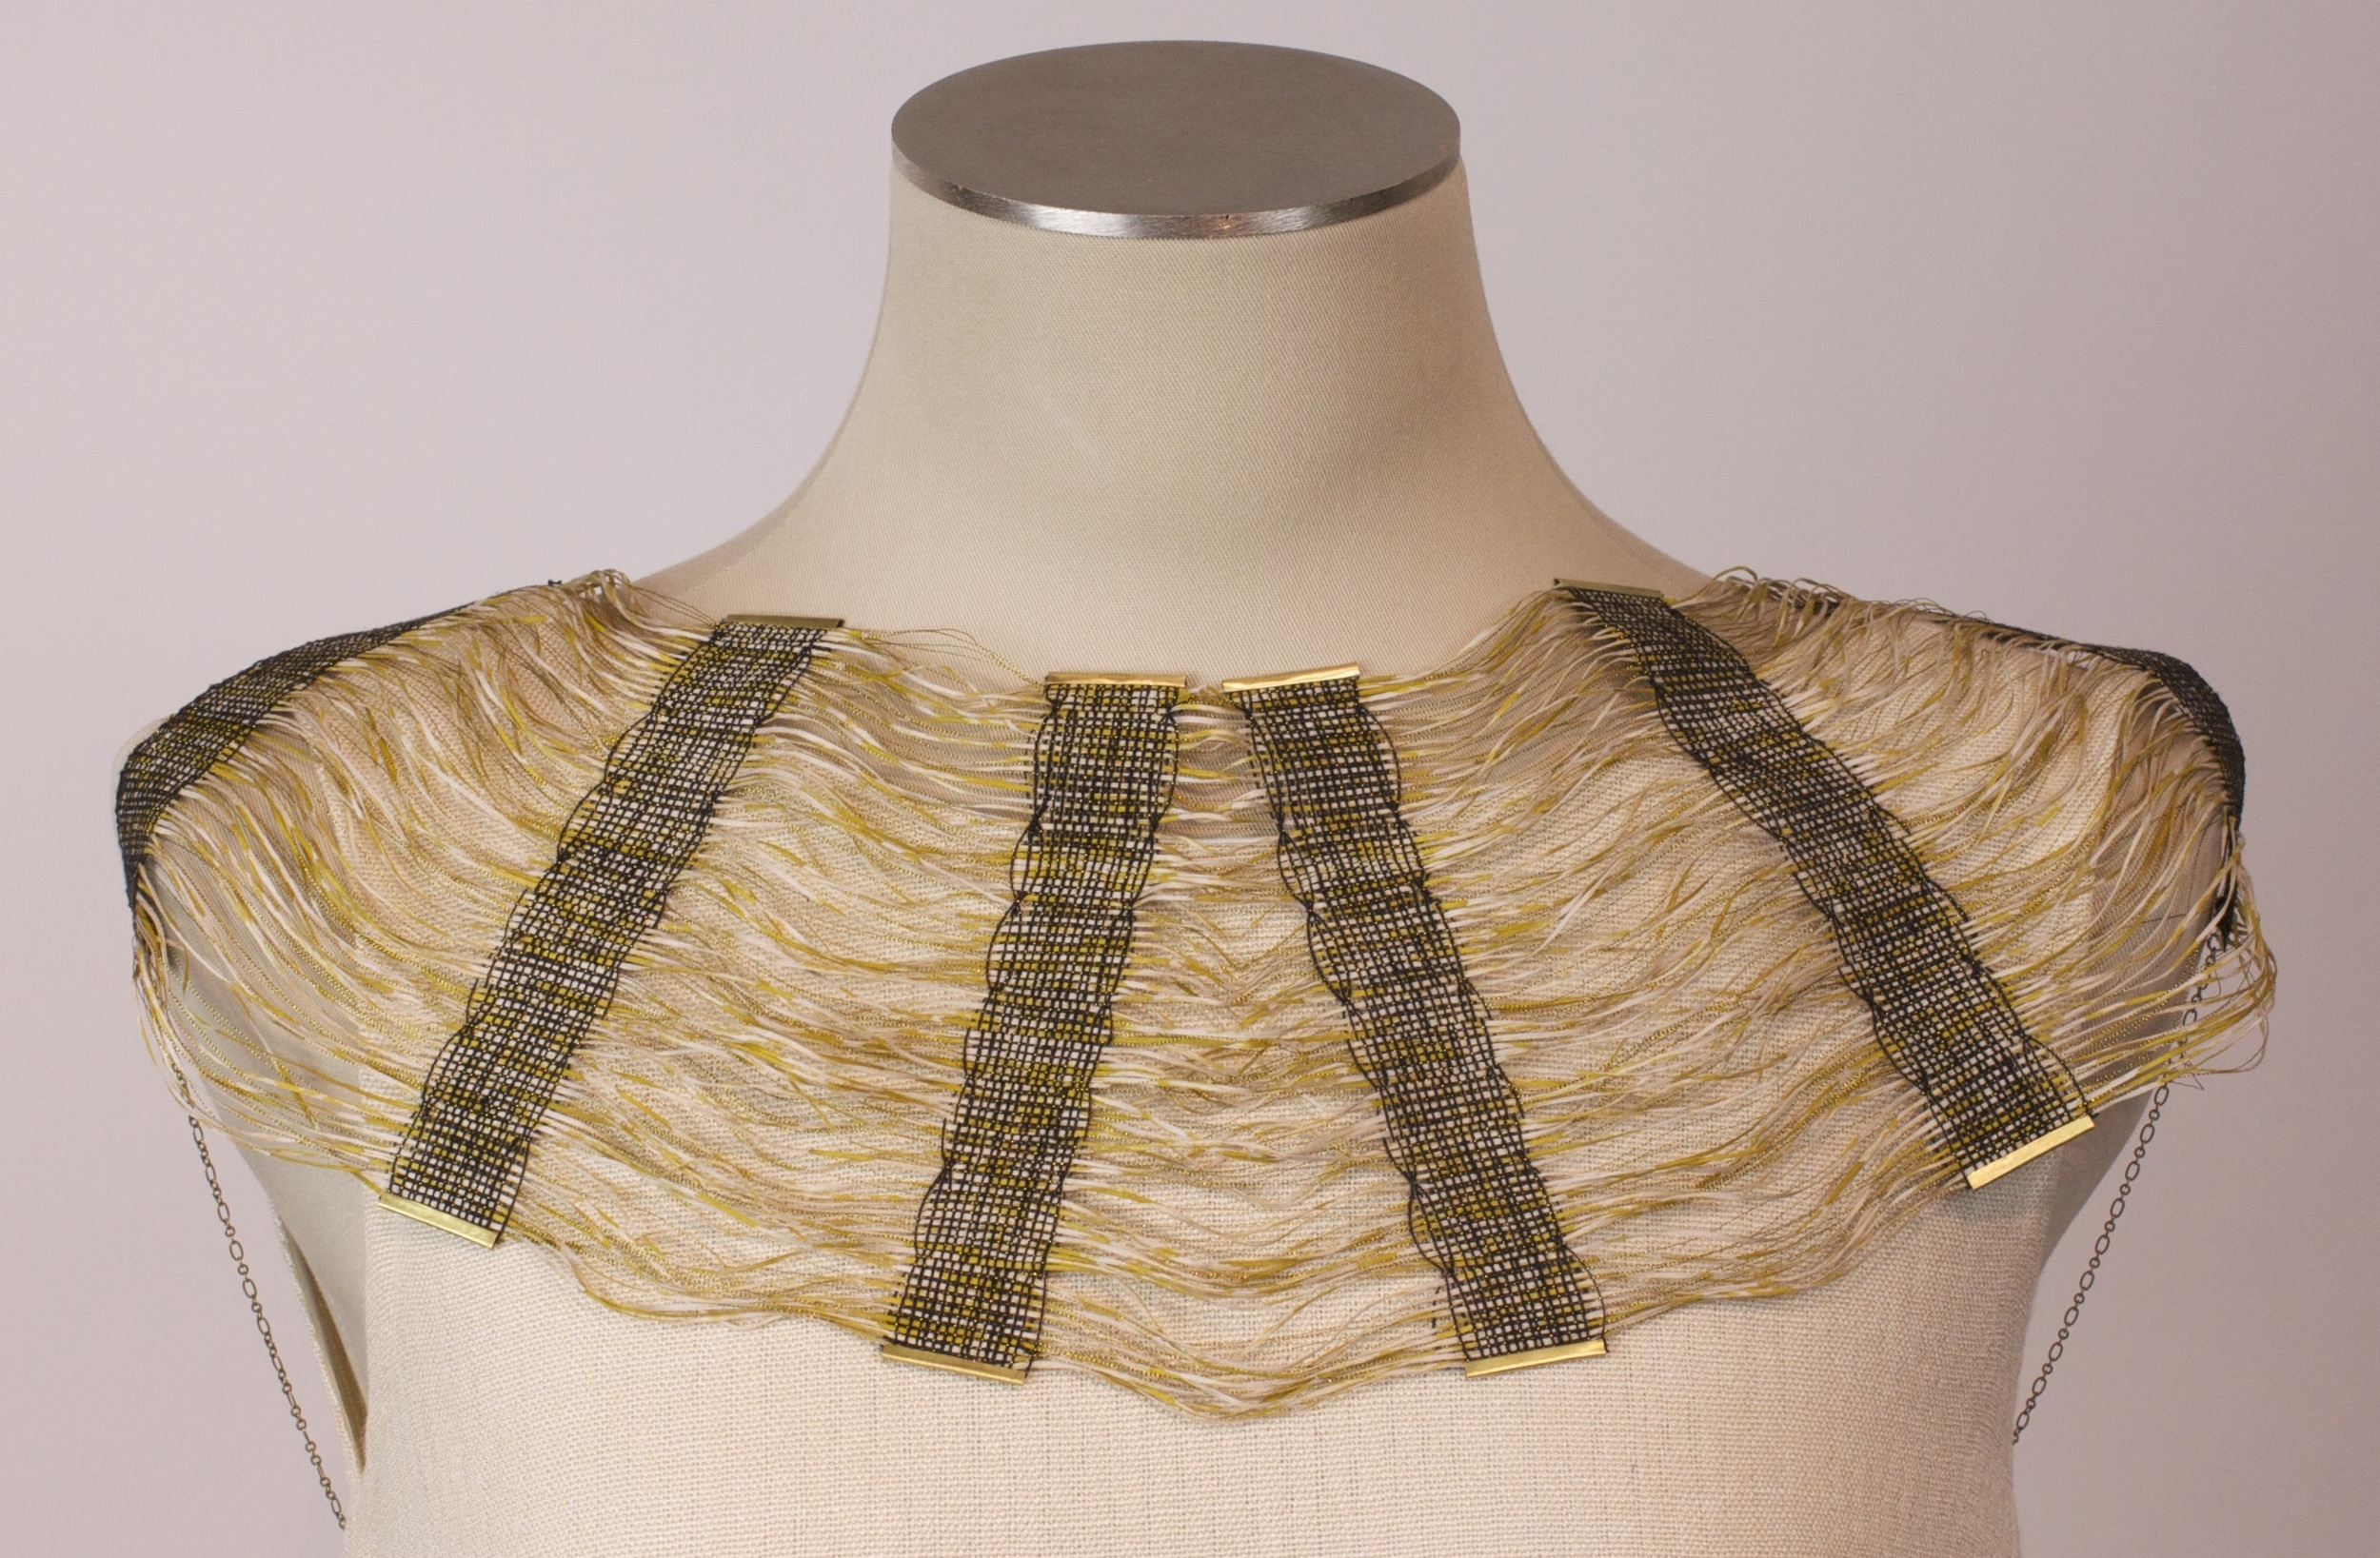 Hand woven collar by Haywood graduate Molly Erickson, 2014